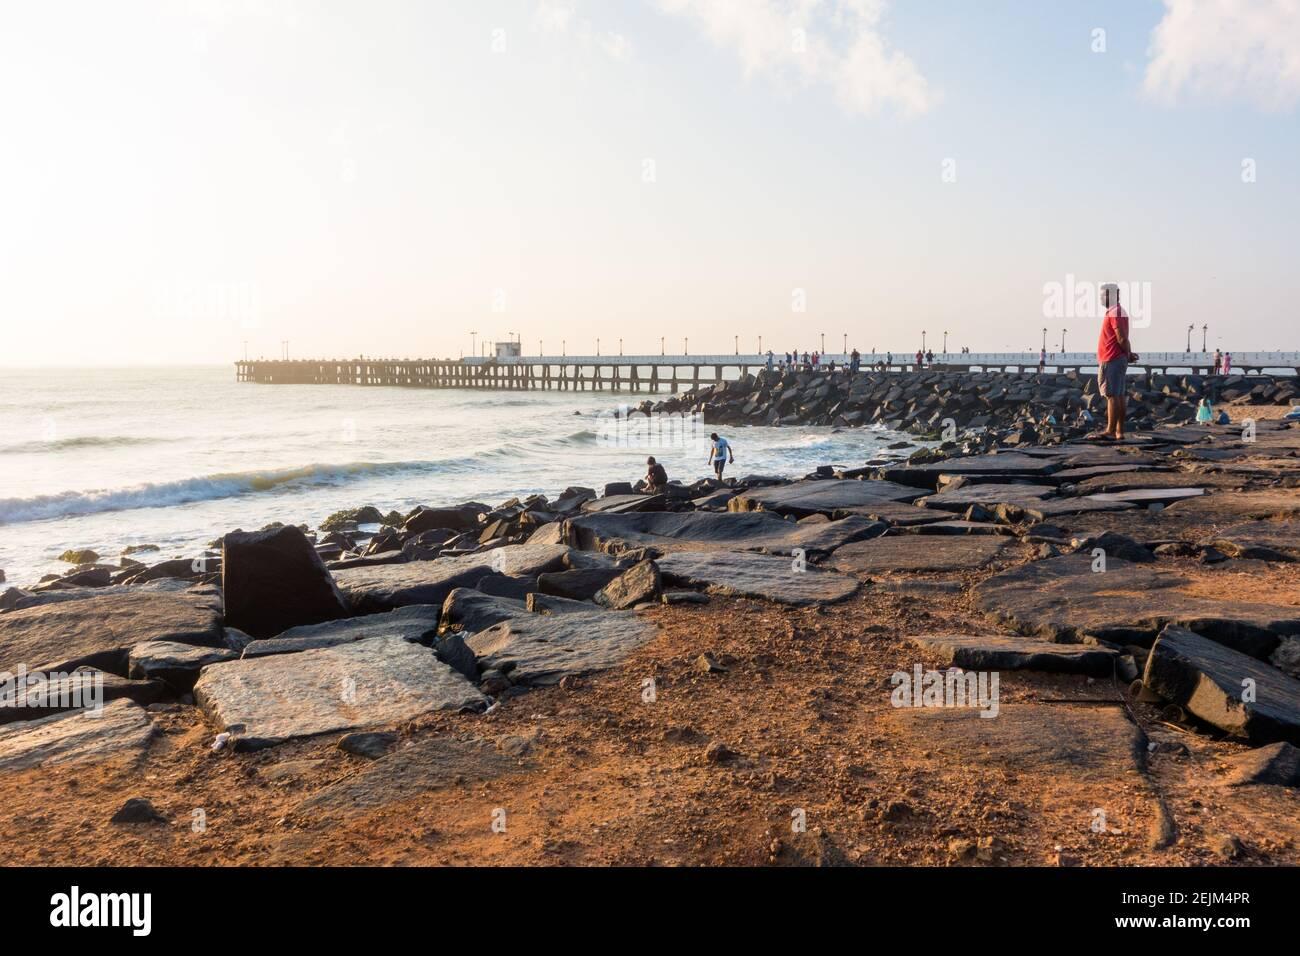 adult-male-watching-sunrise-at-sunrise-point-in-pondycherry-beach-shore-2EJM4PR.jpg